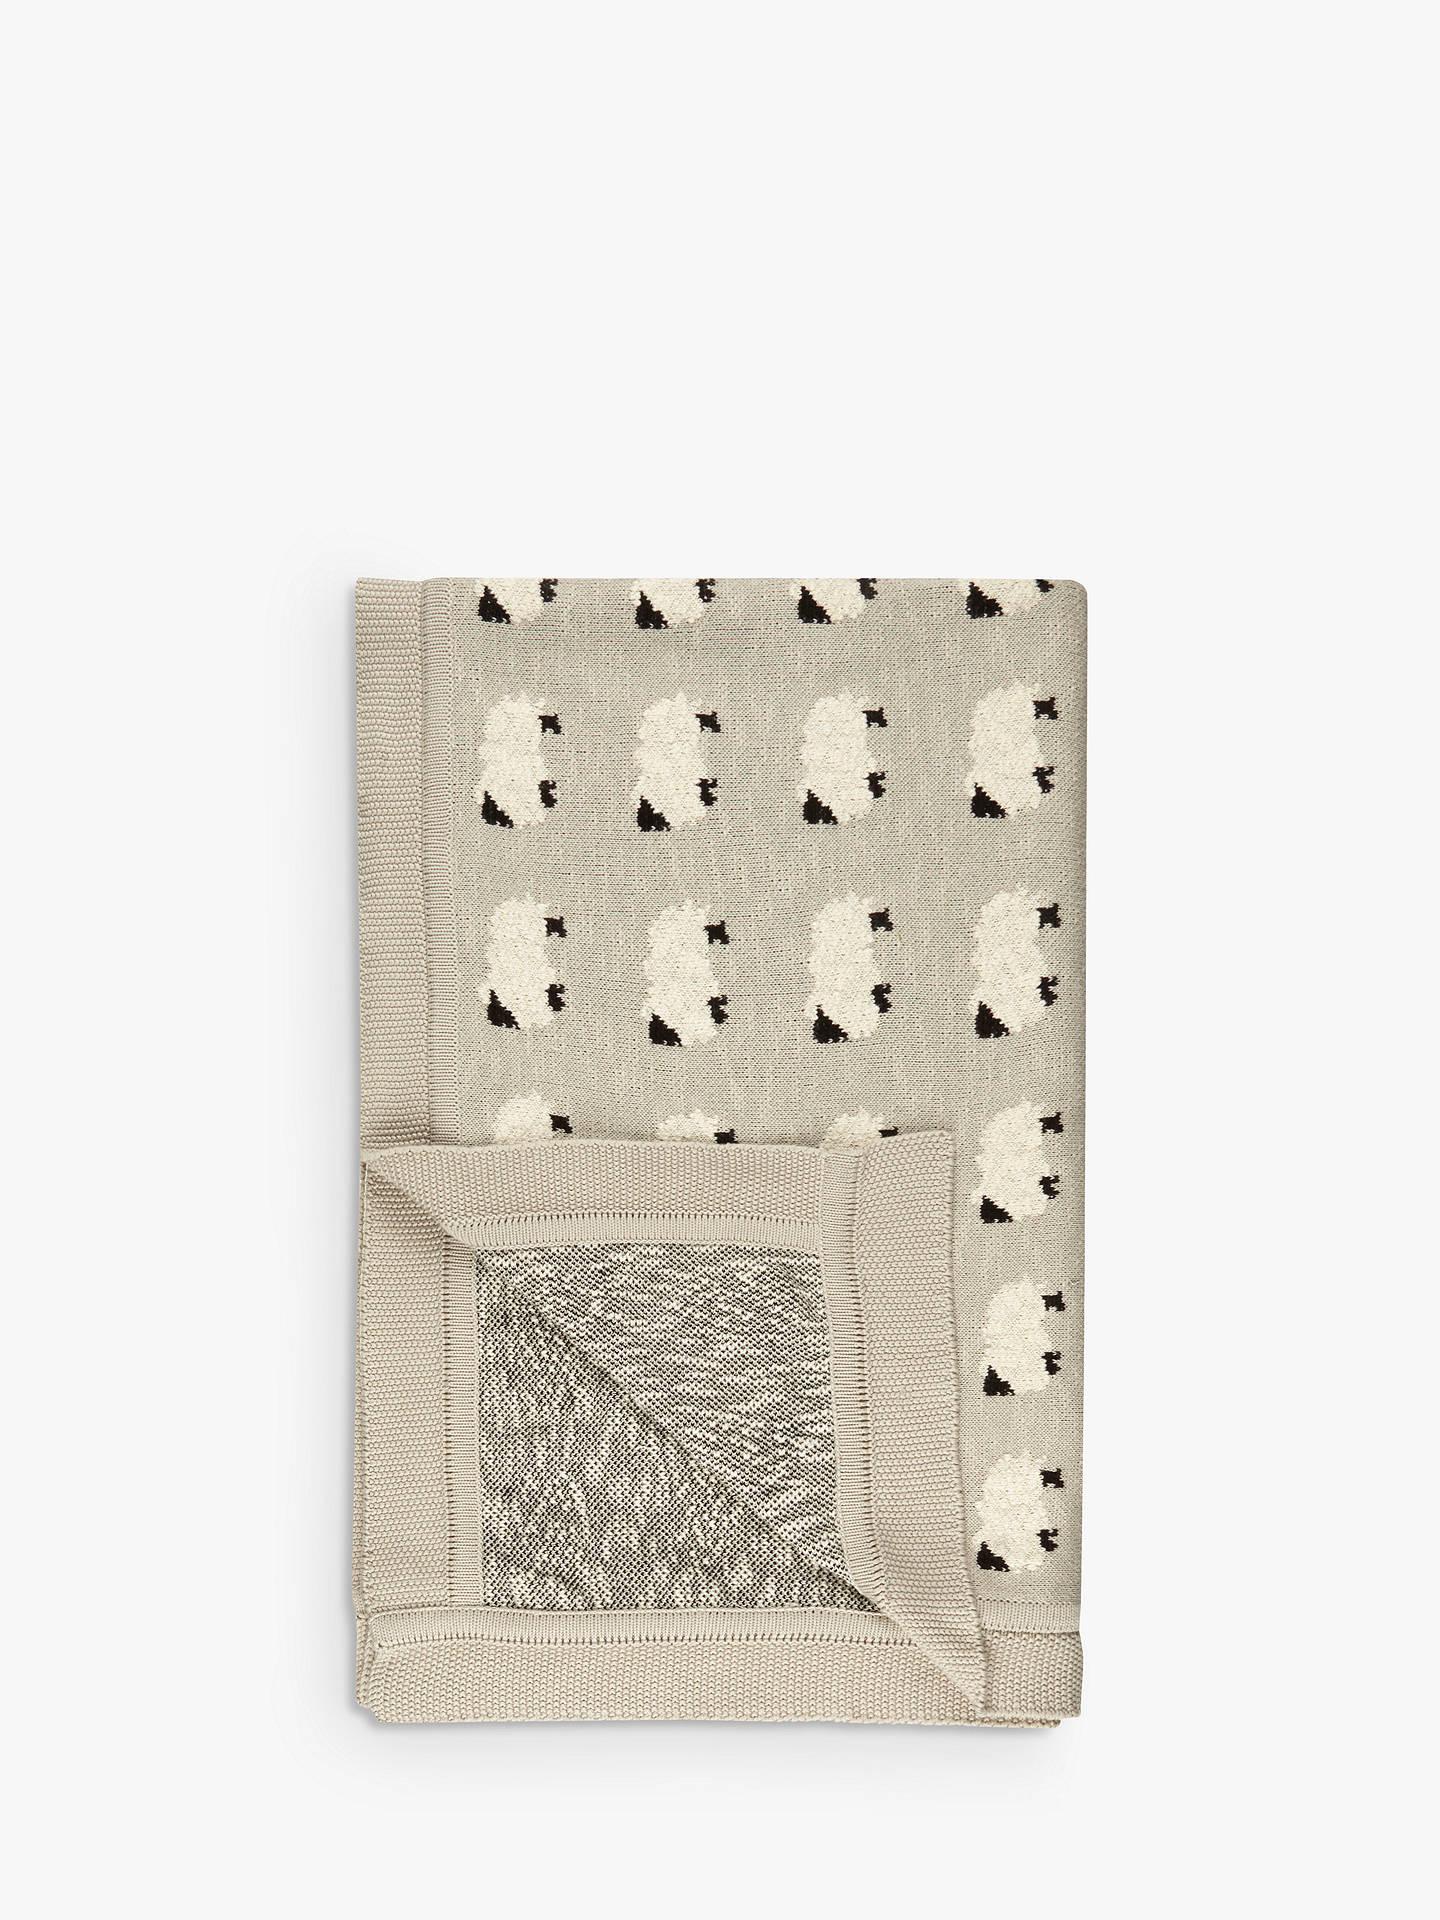 john lewis partners sheep throw grey at john lewis. Black Bedroom Furniture Sets. Home Design Ideas